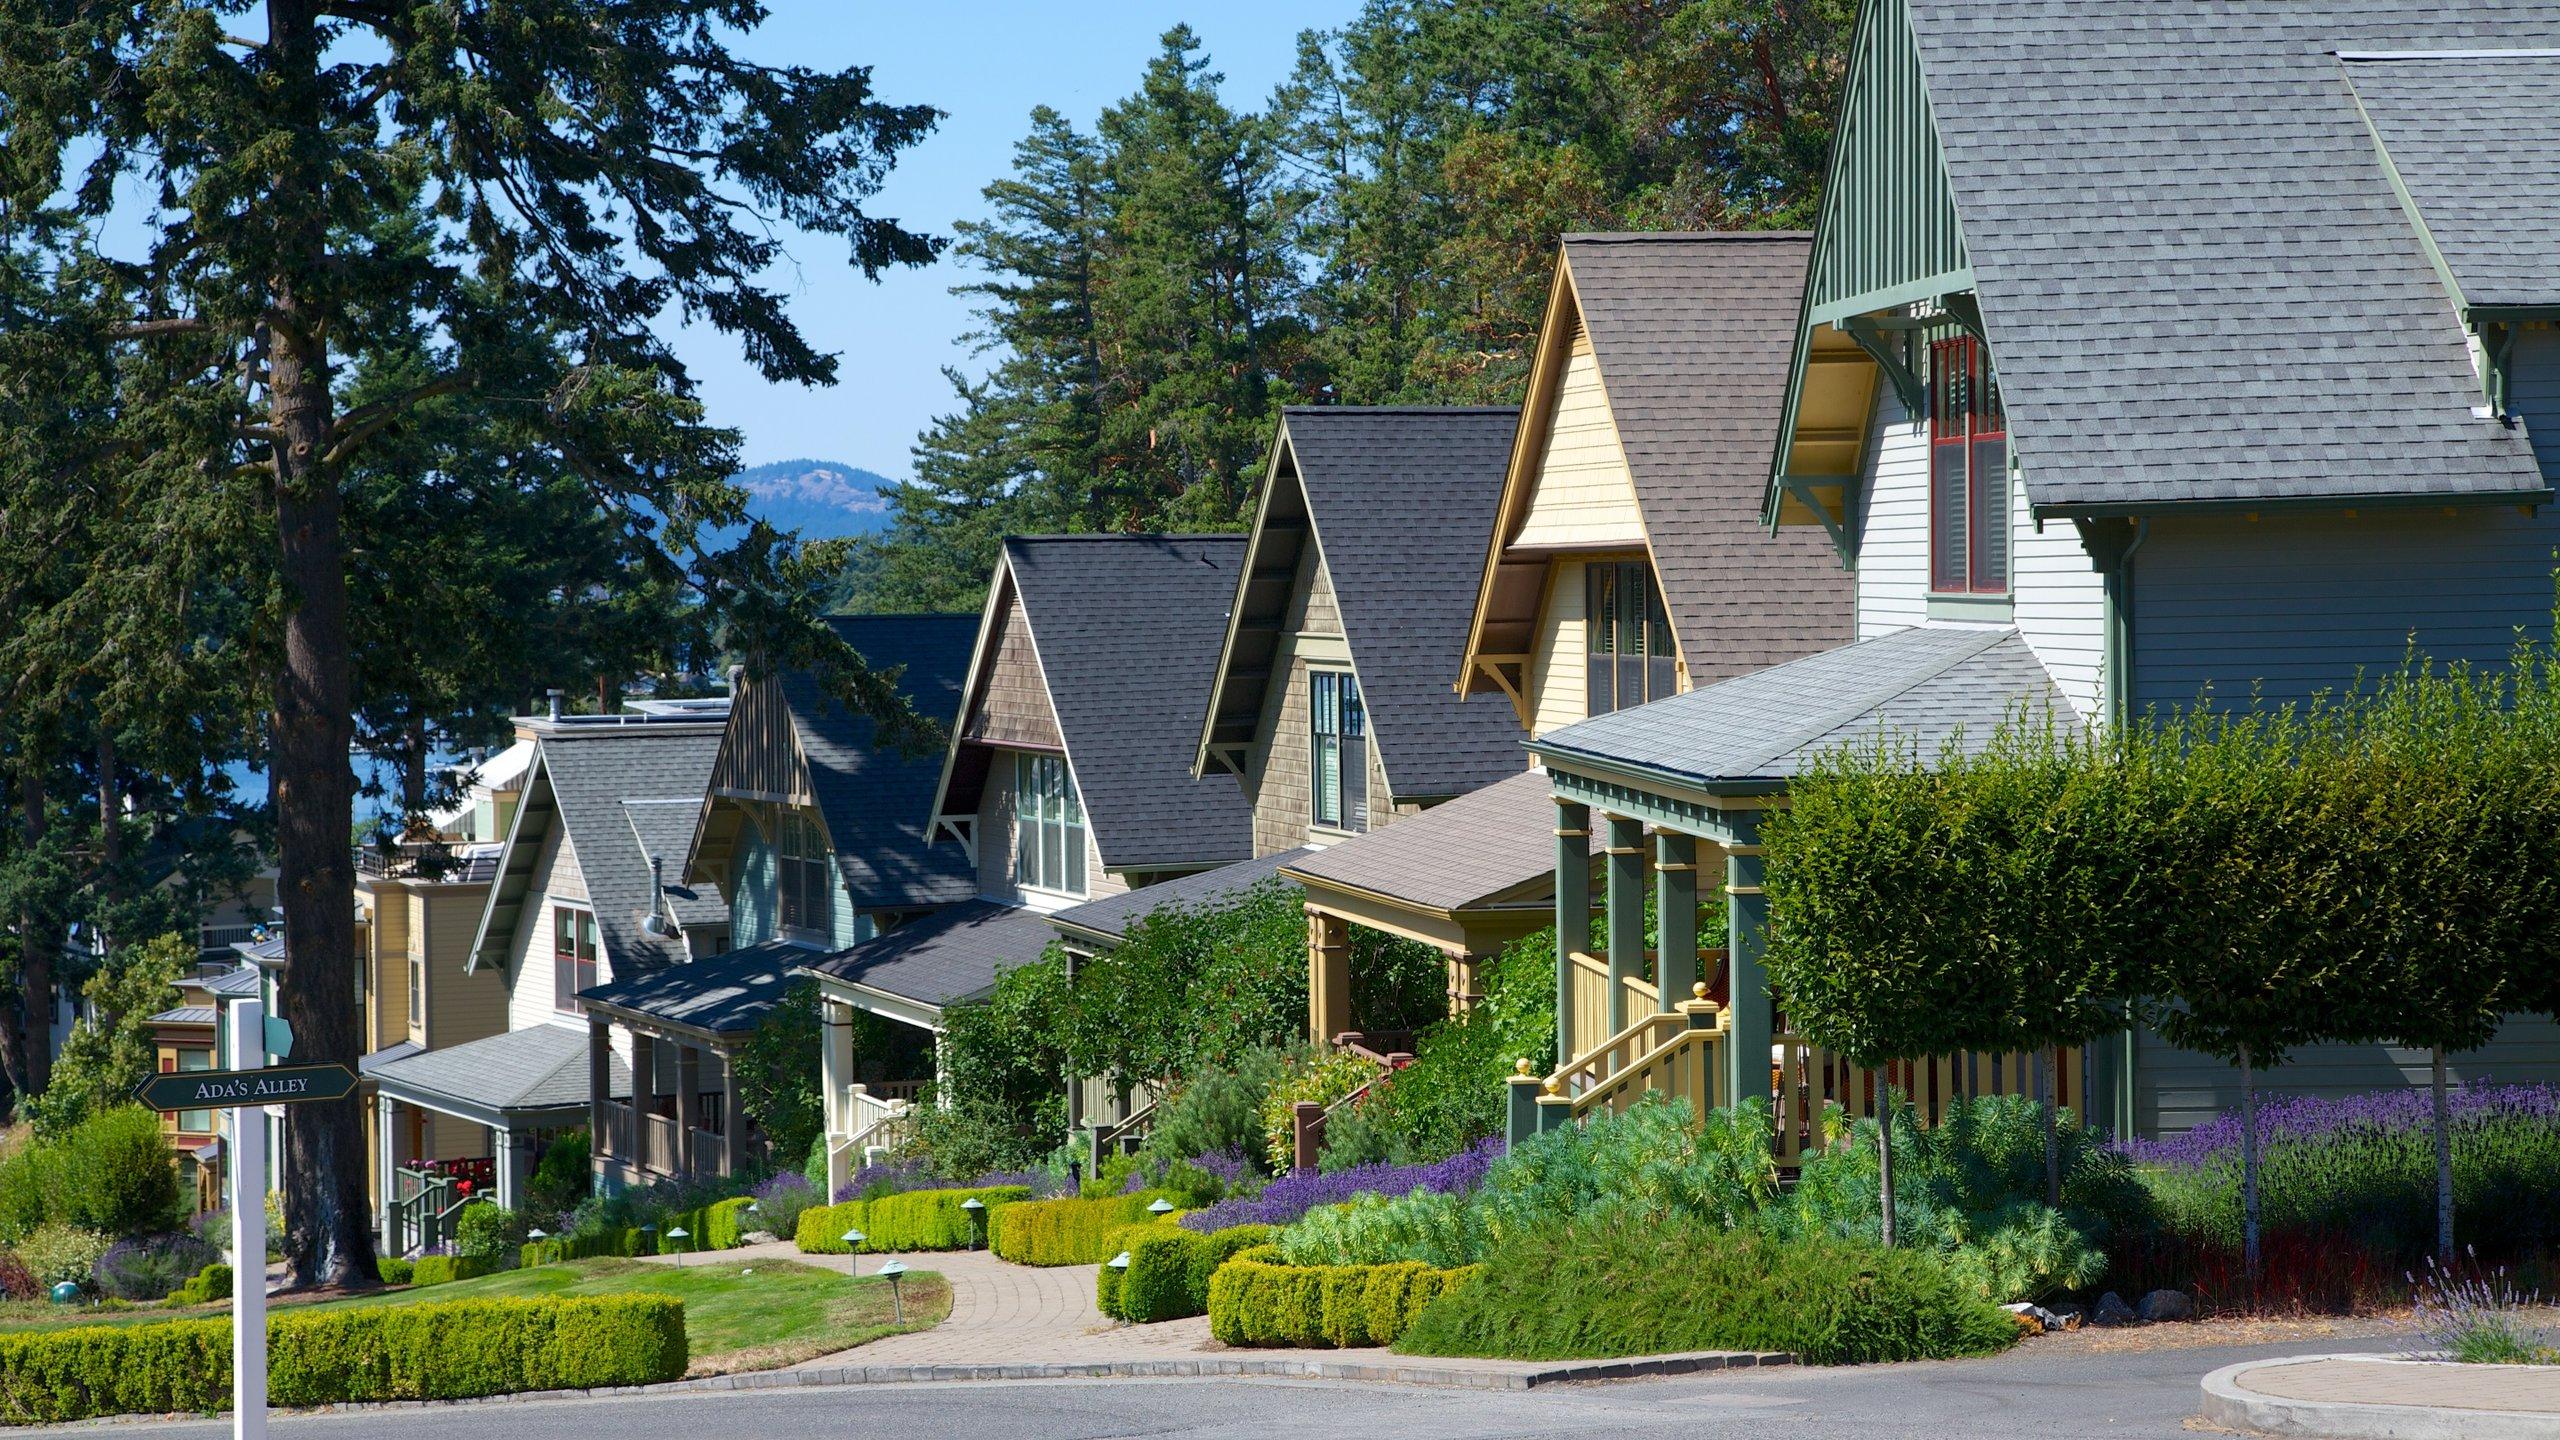 Roche Harbor, Washington, United States of America